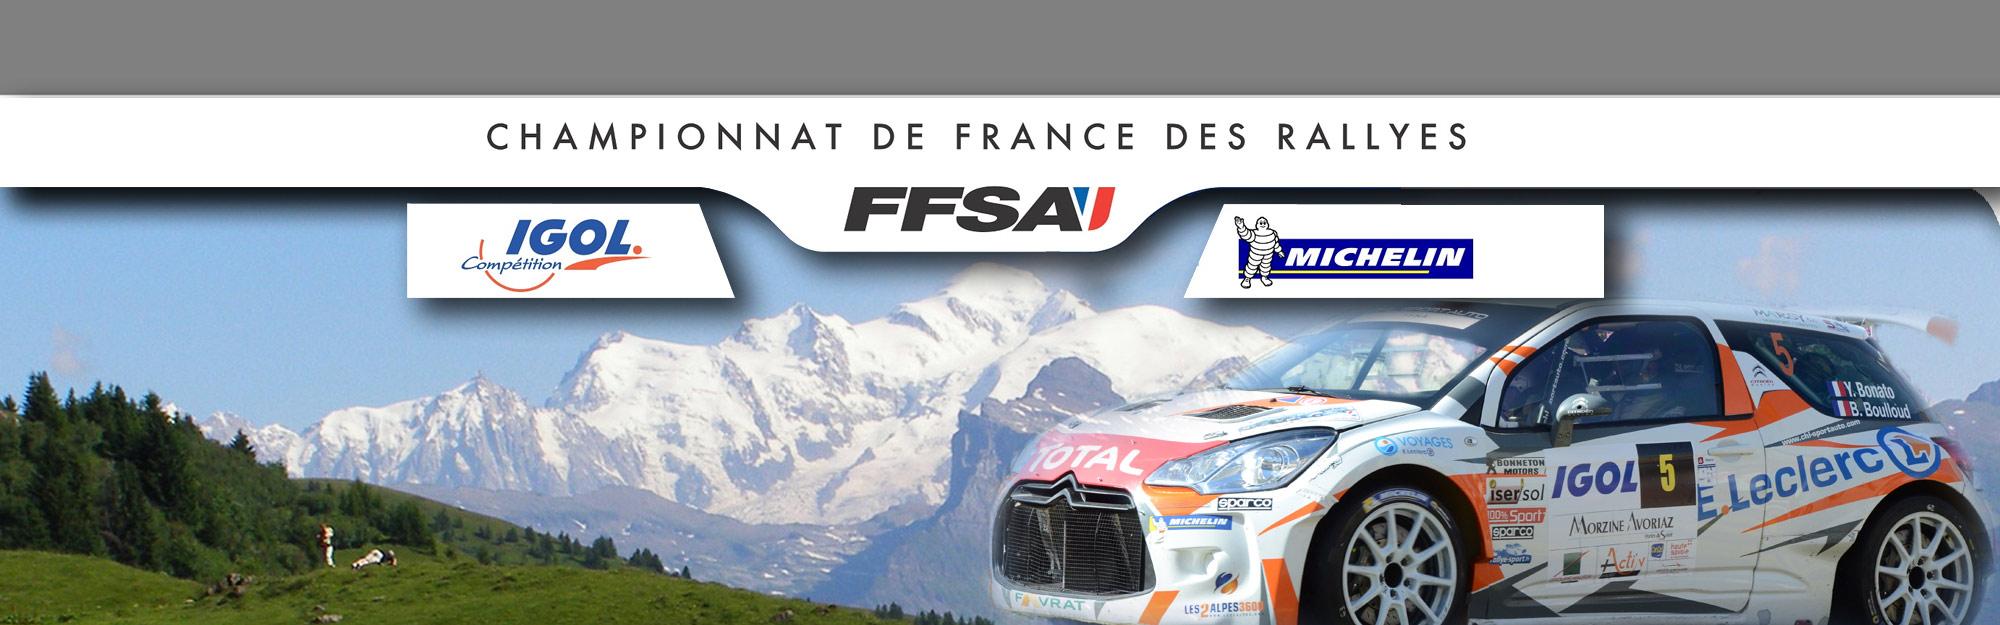 [Rallye] 2019 - Championnat de France asphalte Slide-show2018